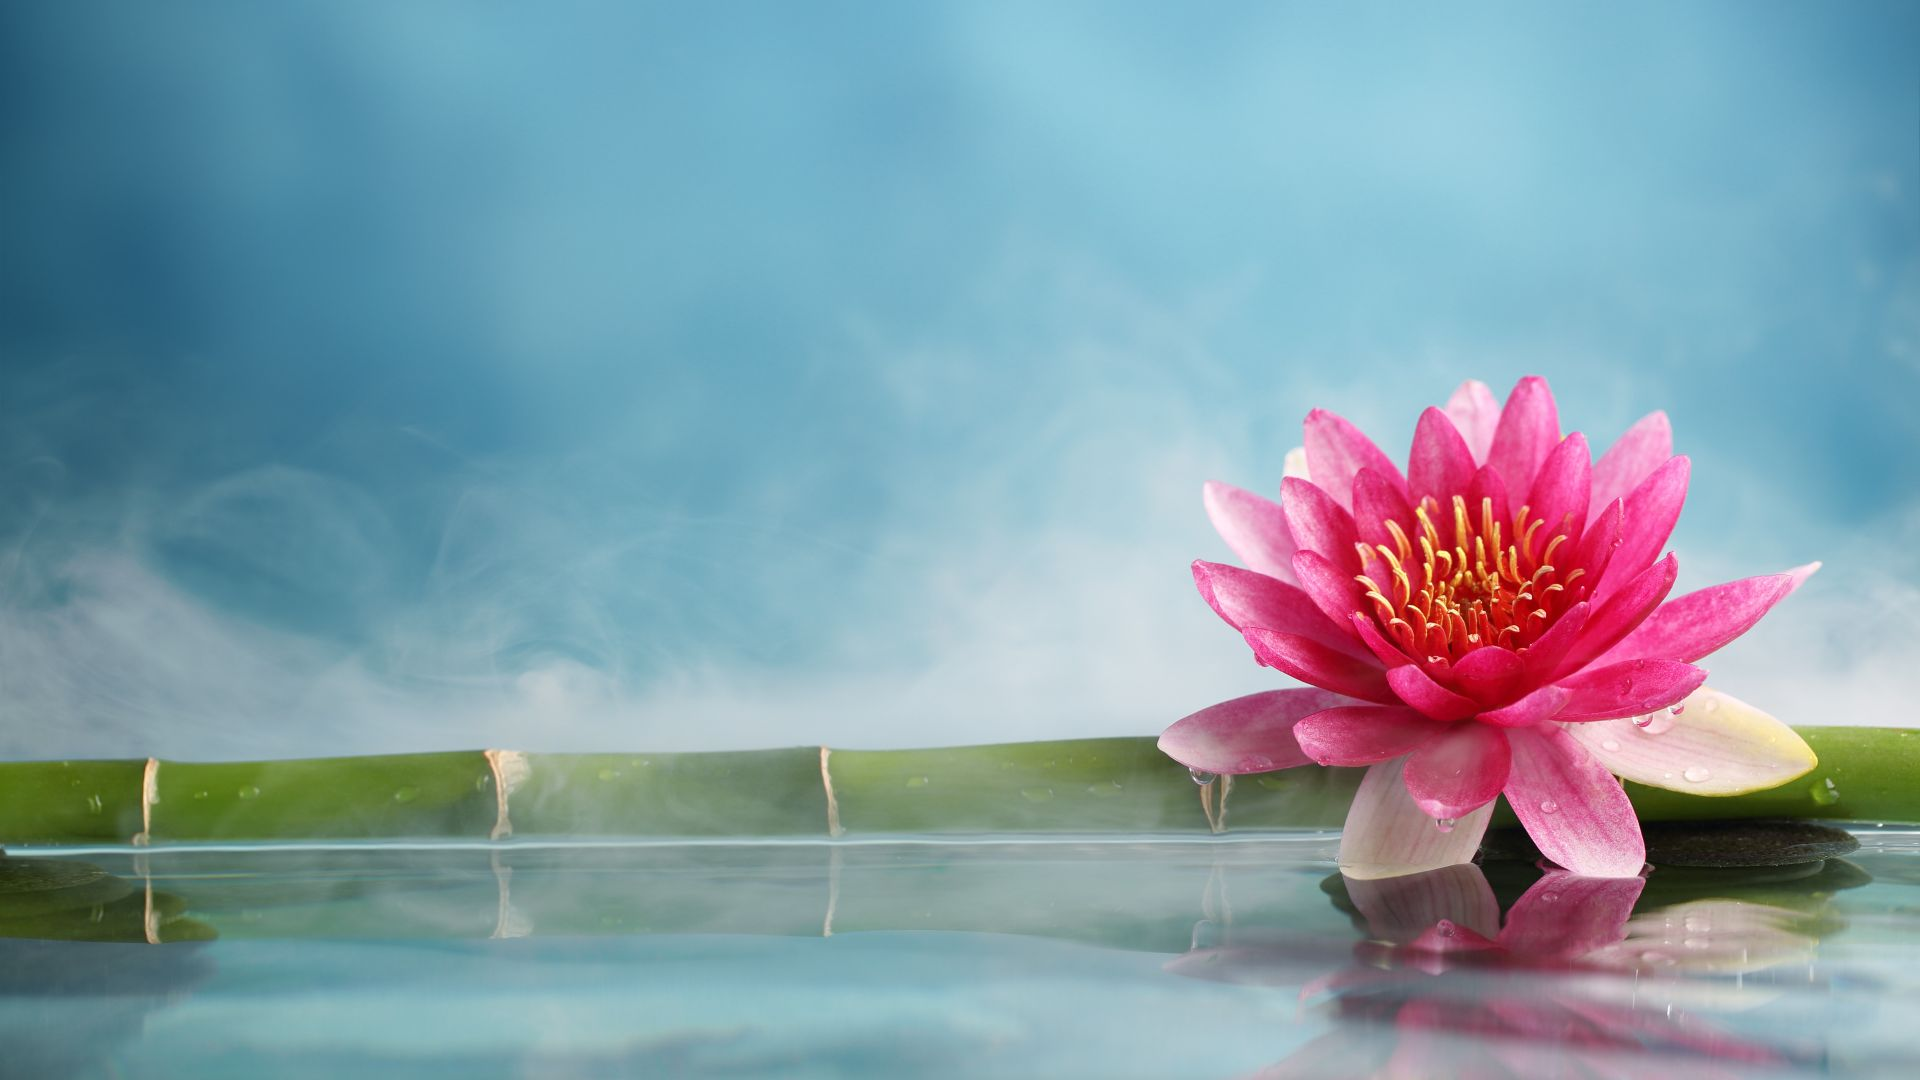 Luxury Lotus Motorcycle Hd Wallpapers And Desktop: Wallpaper Lotus, Flower, Bamboo, Water, 5k, Nature #16043